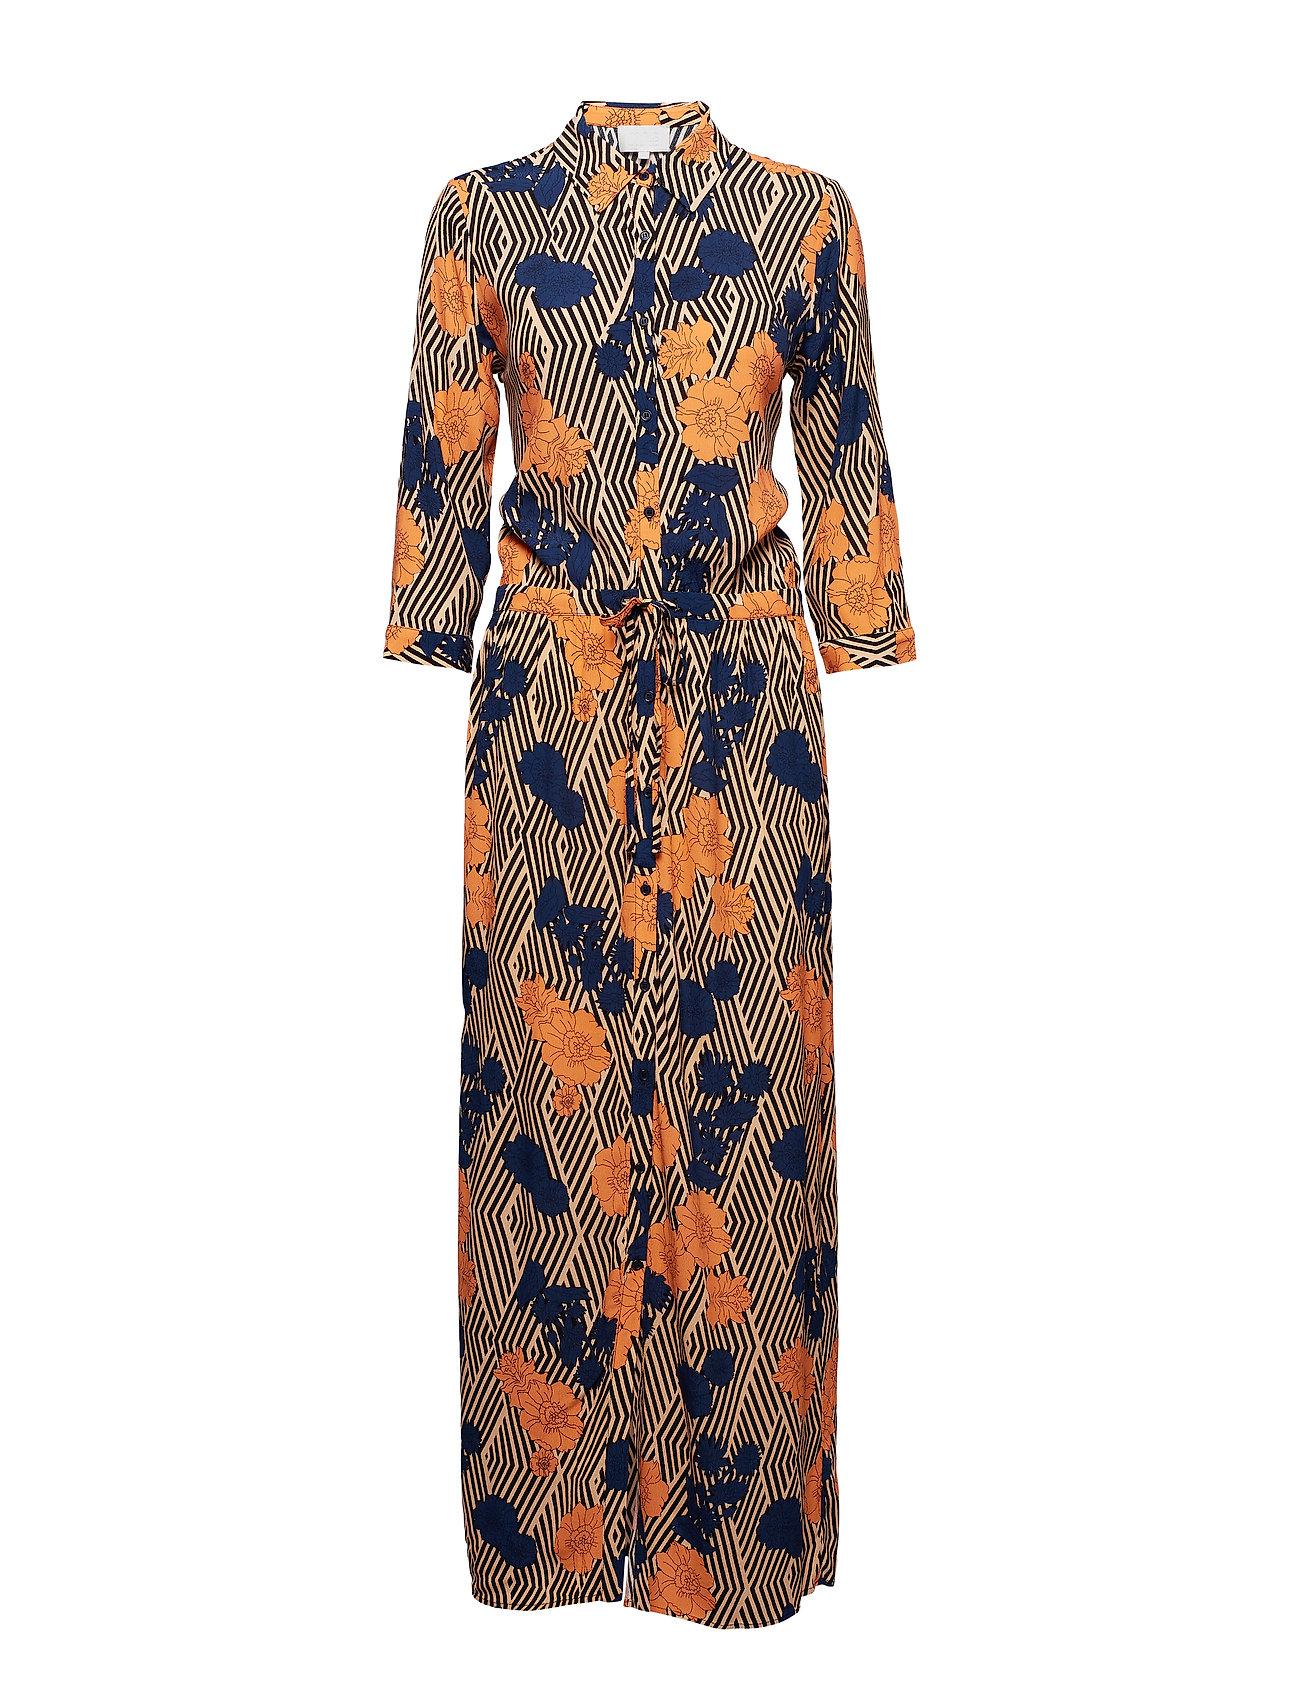 150dc5d1156 Minus Kriss long shirt dress - Dresses. £130. 137. Colour  STRIPED FLOWER  PRINT